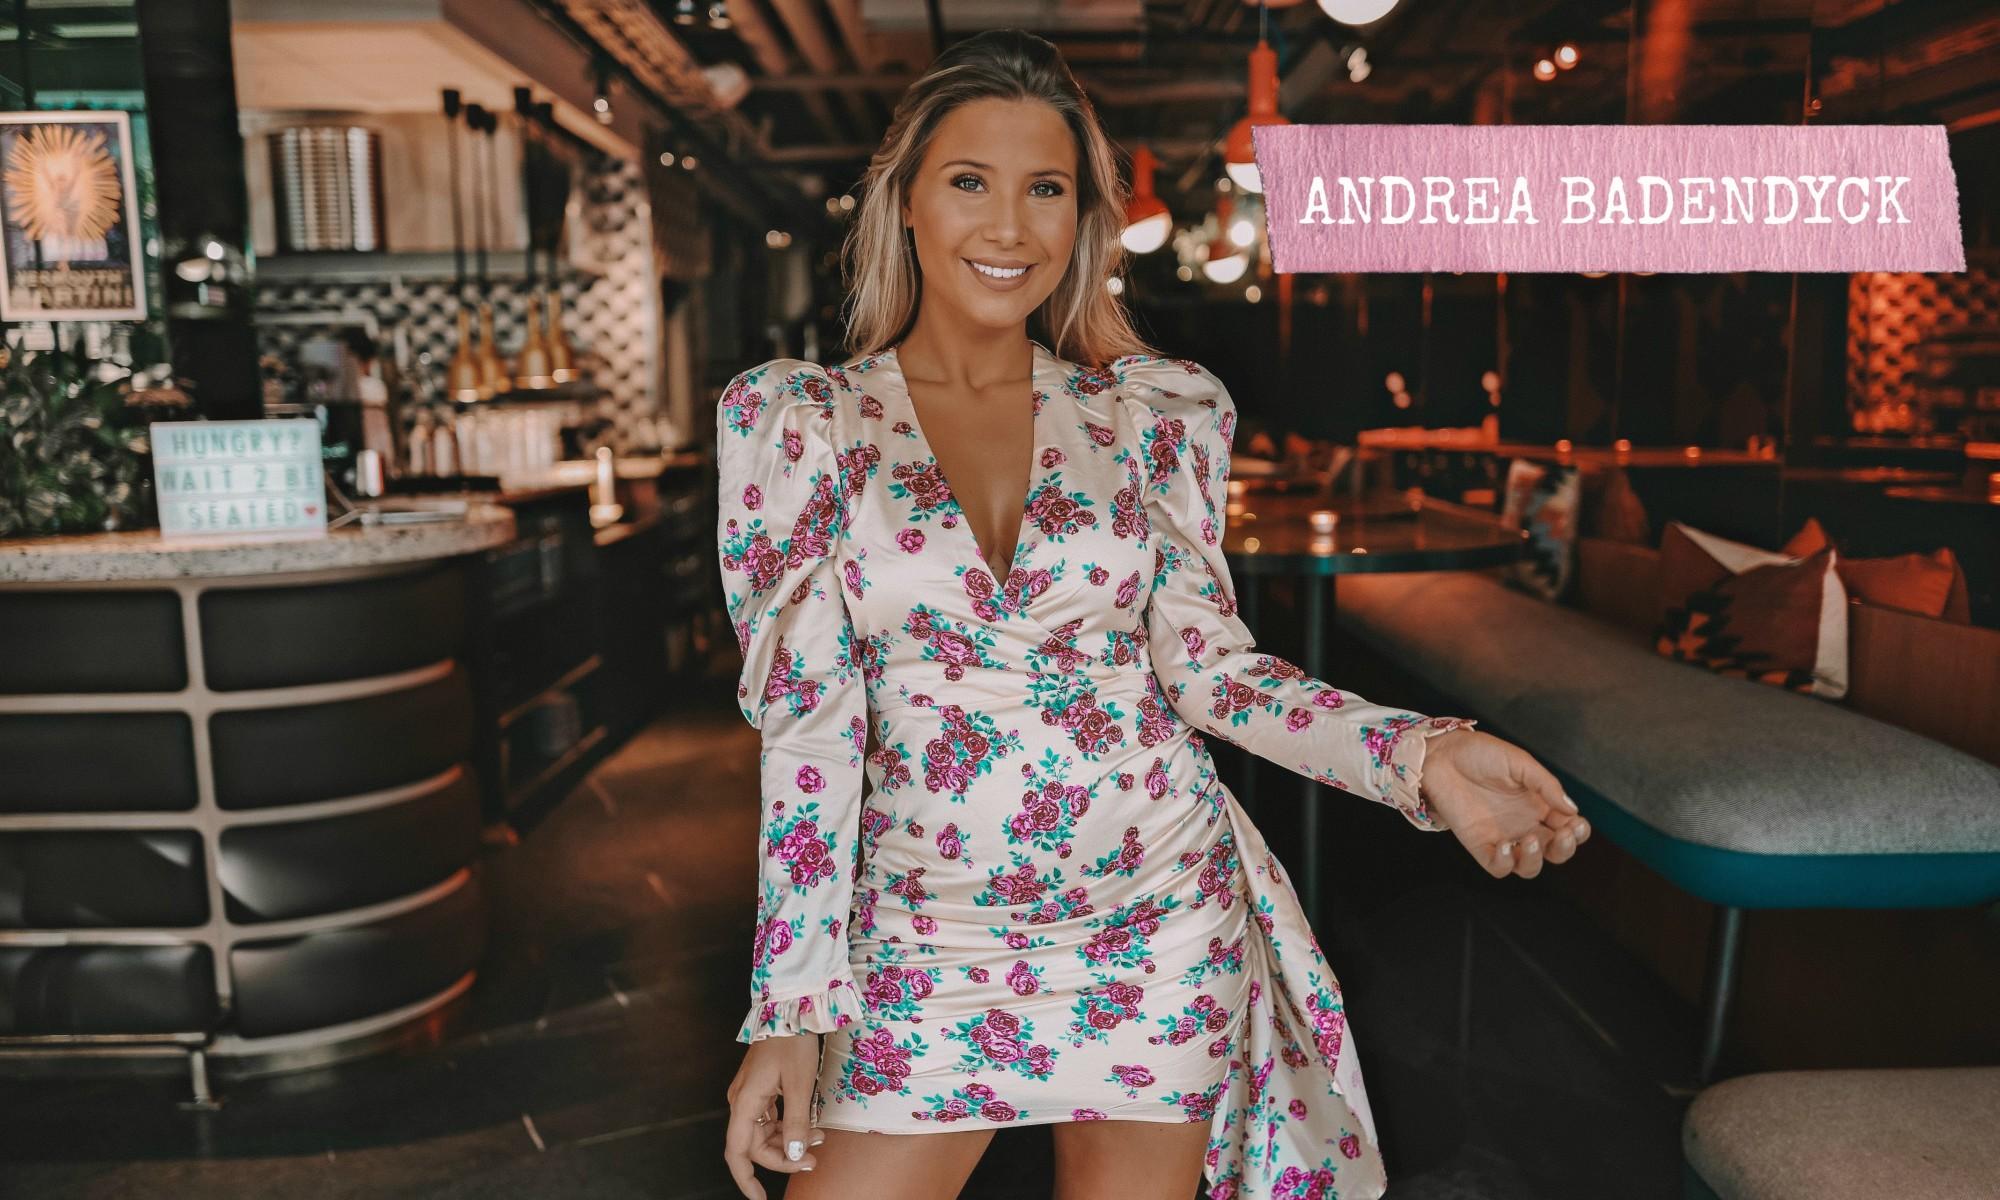 Andrea Badendyck